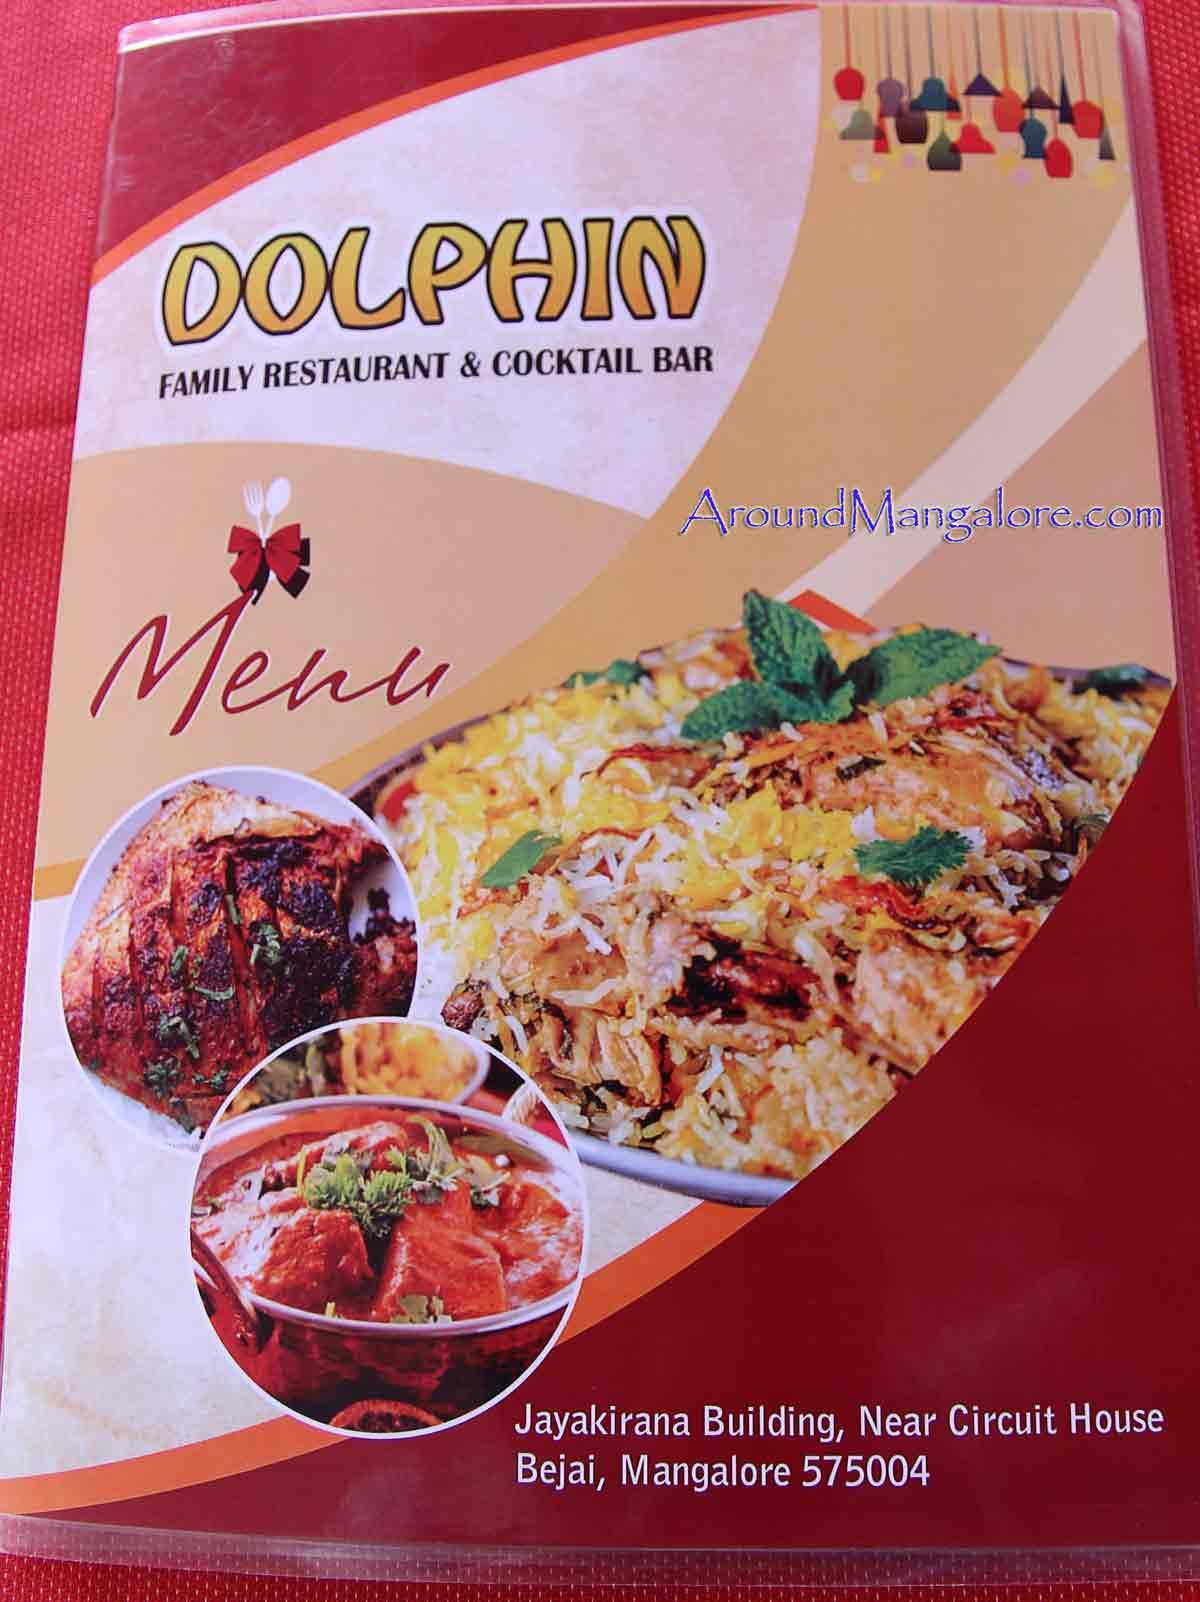 Food Menu Dolphin Restaurant Cocktail Bar Bejai P4 - Dolphin Family Restaurant & Cocktail Bar - Bejai